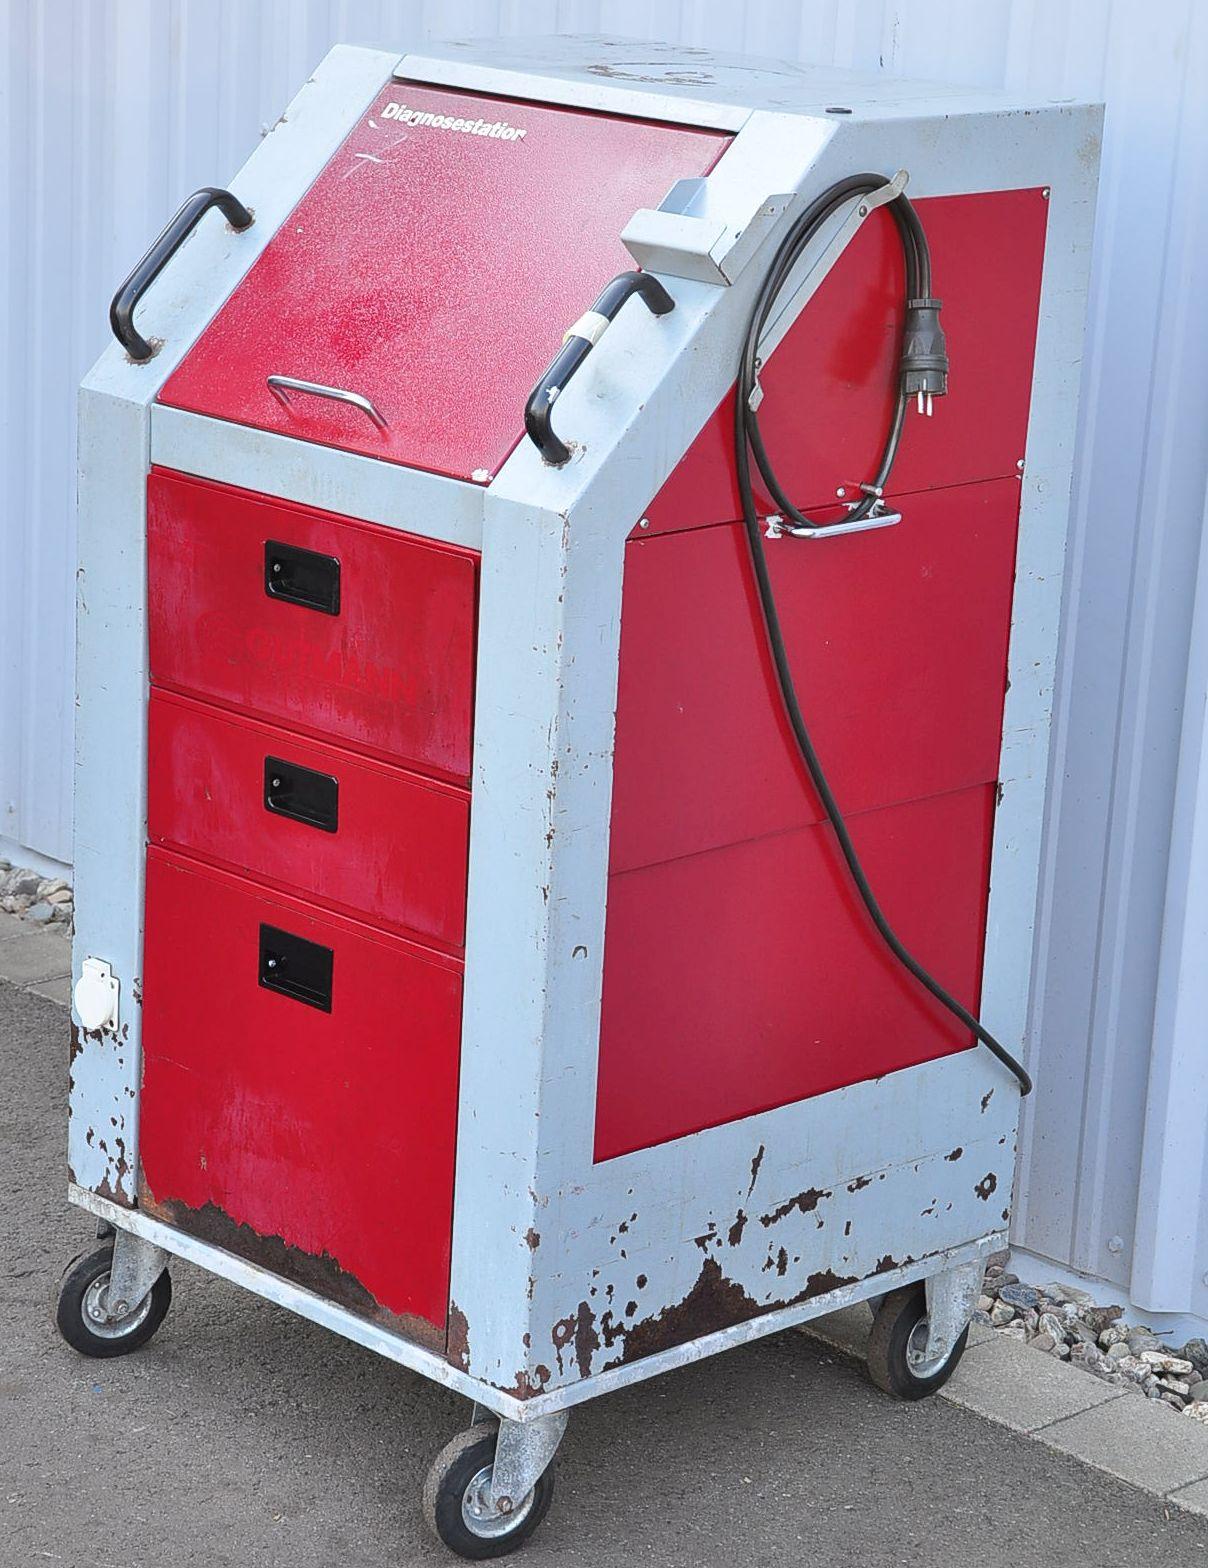 gutmann mega macs diagnosestation diagnosewagen diagnosestationswagen ebay. Black Bedroom Furniture Sets. Home Design Ideas